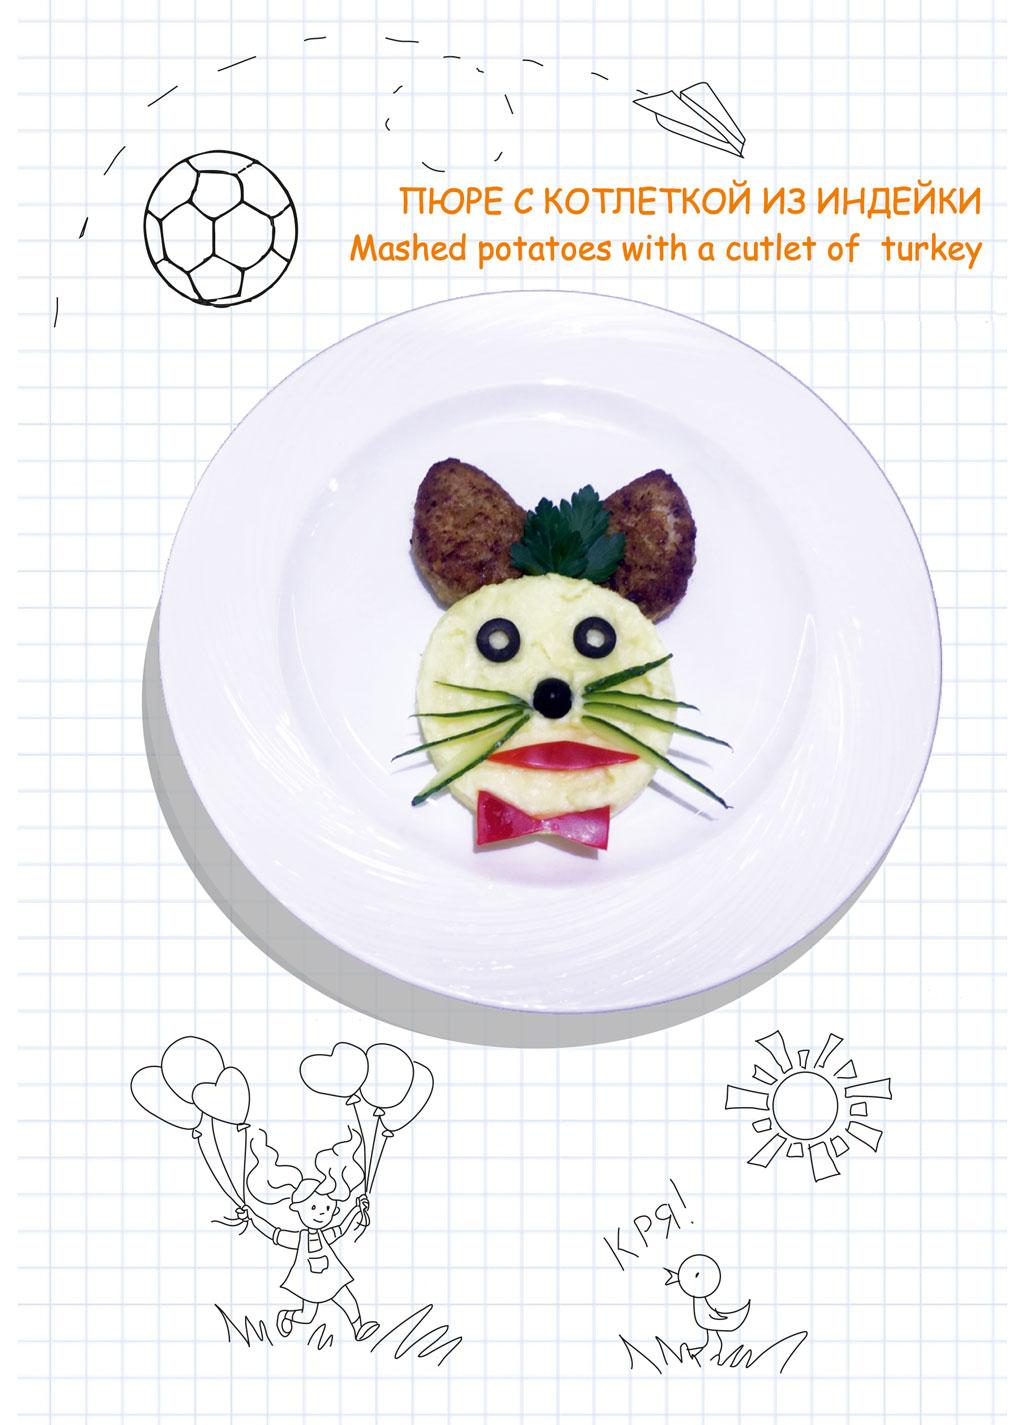 Пюре с котлеткой из индейки (Mashed potatoes with a cutlet of turkey) в ресторане Аннам Брахма в Оренбурге.jpg